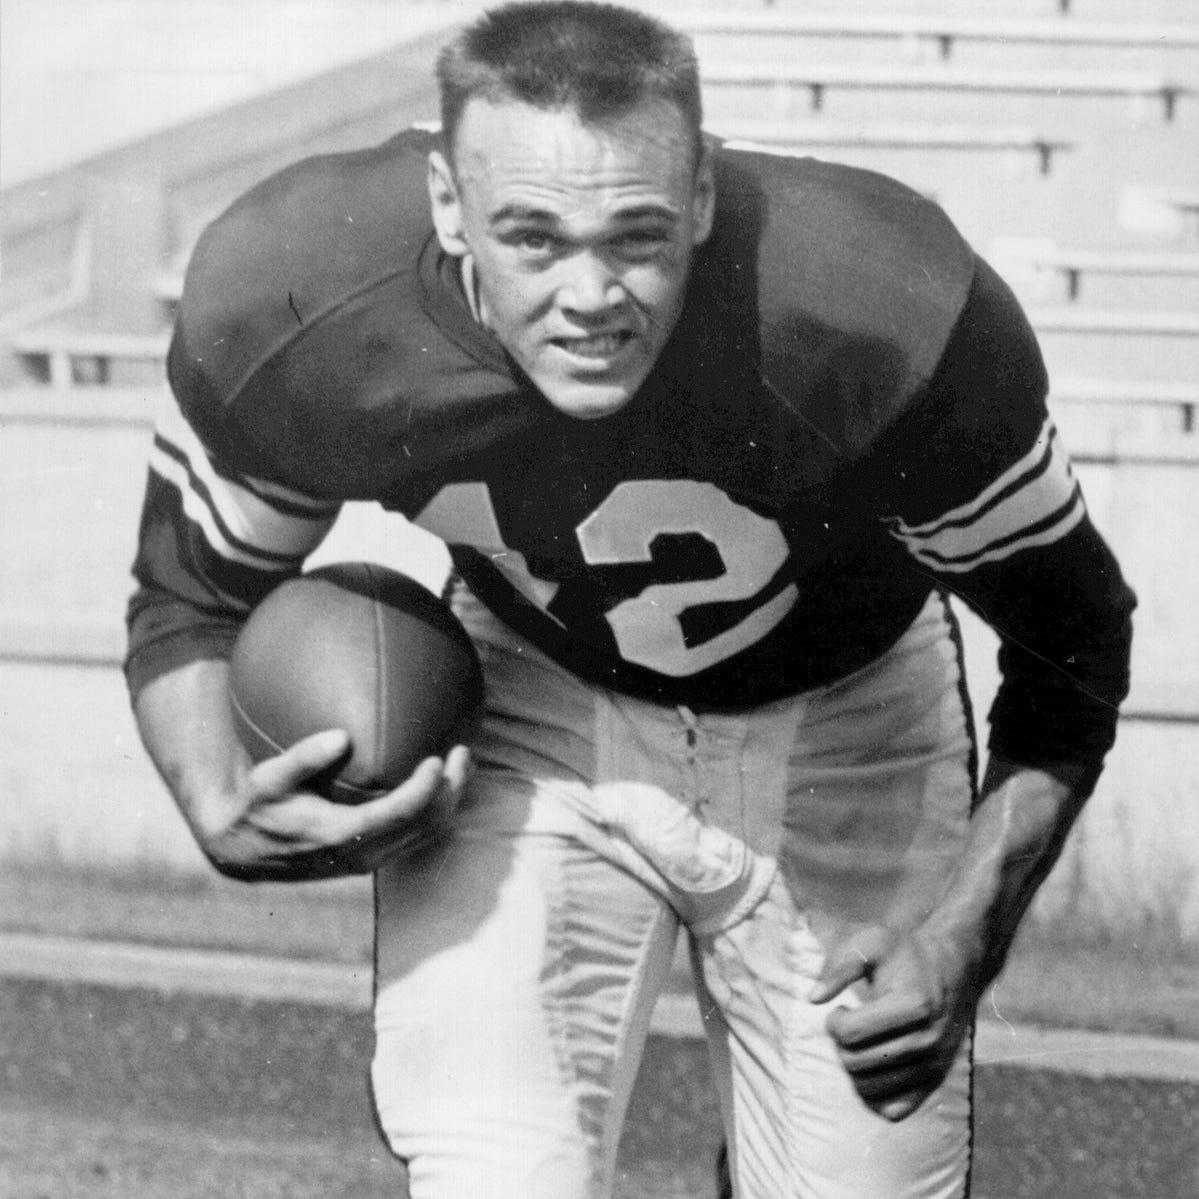 Gene Keady, college football phenom, 1958 NFL draft pick and 4-sport athlete